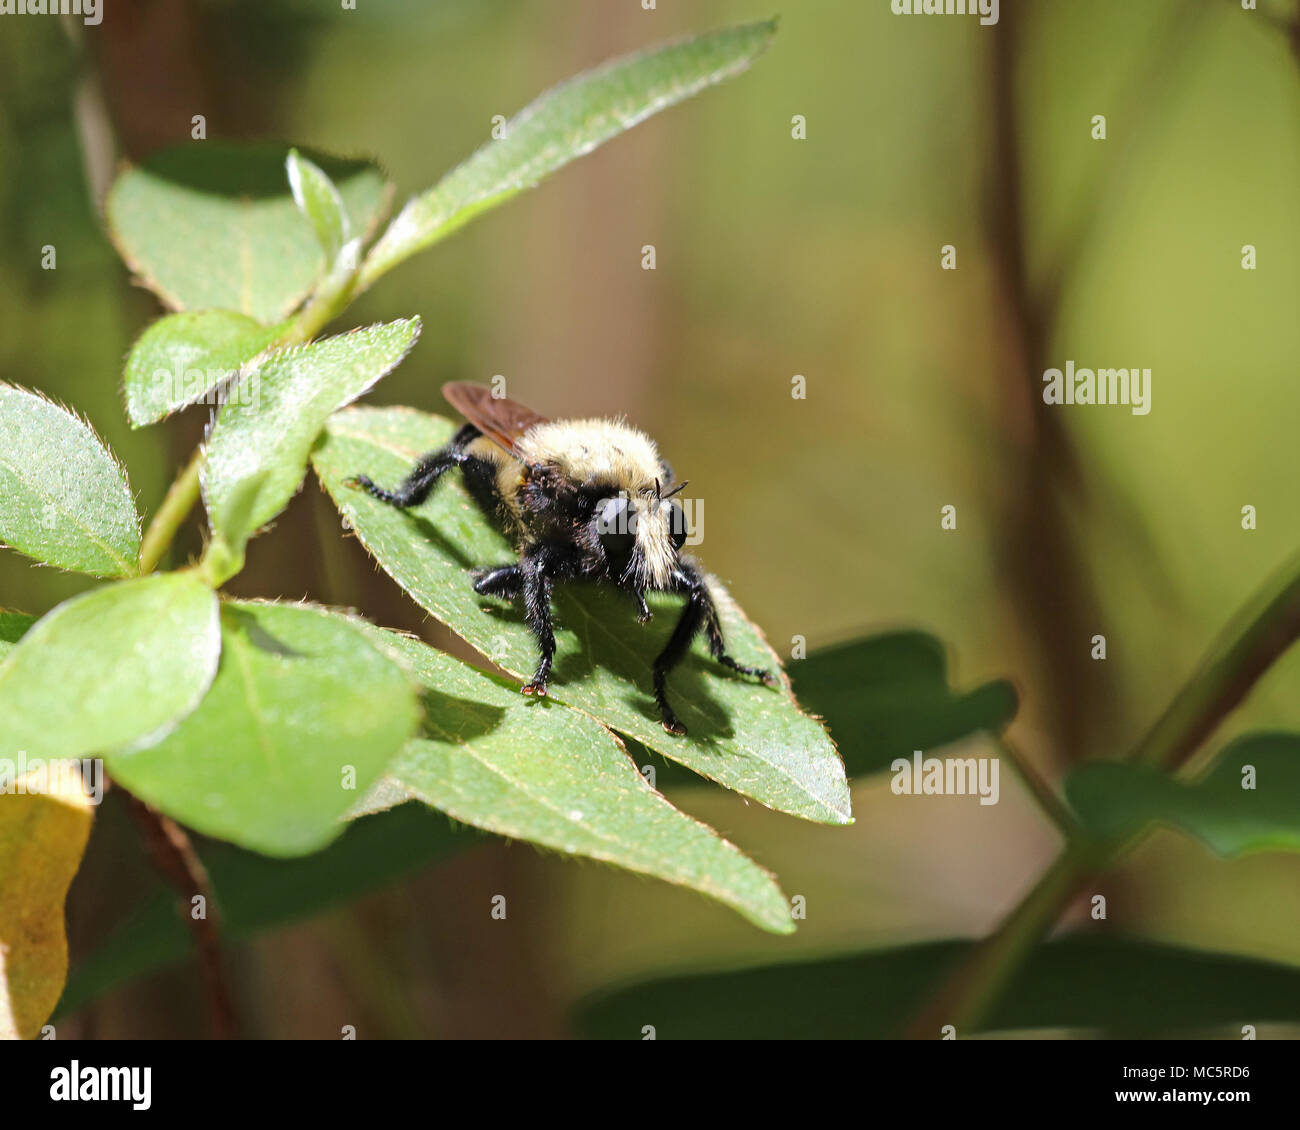 Nahaufnahme einer Florida Biene Killer (Mallophora bomboides) Stockbild